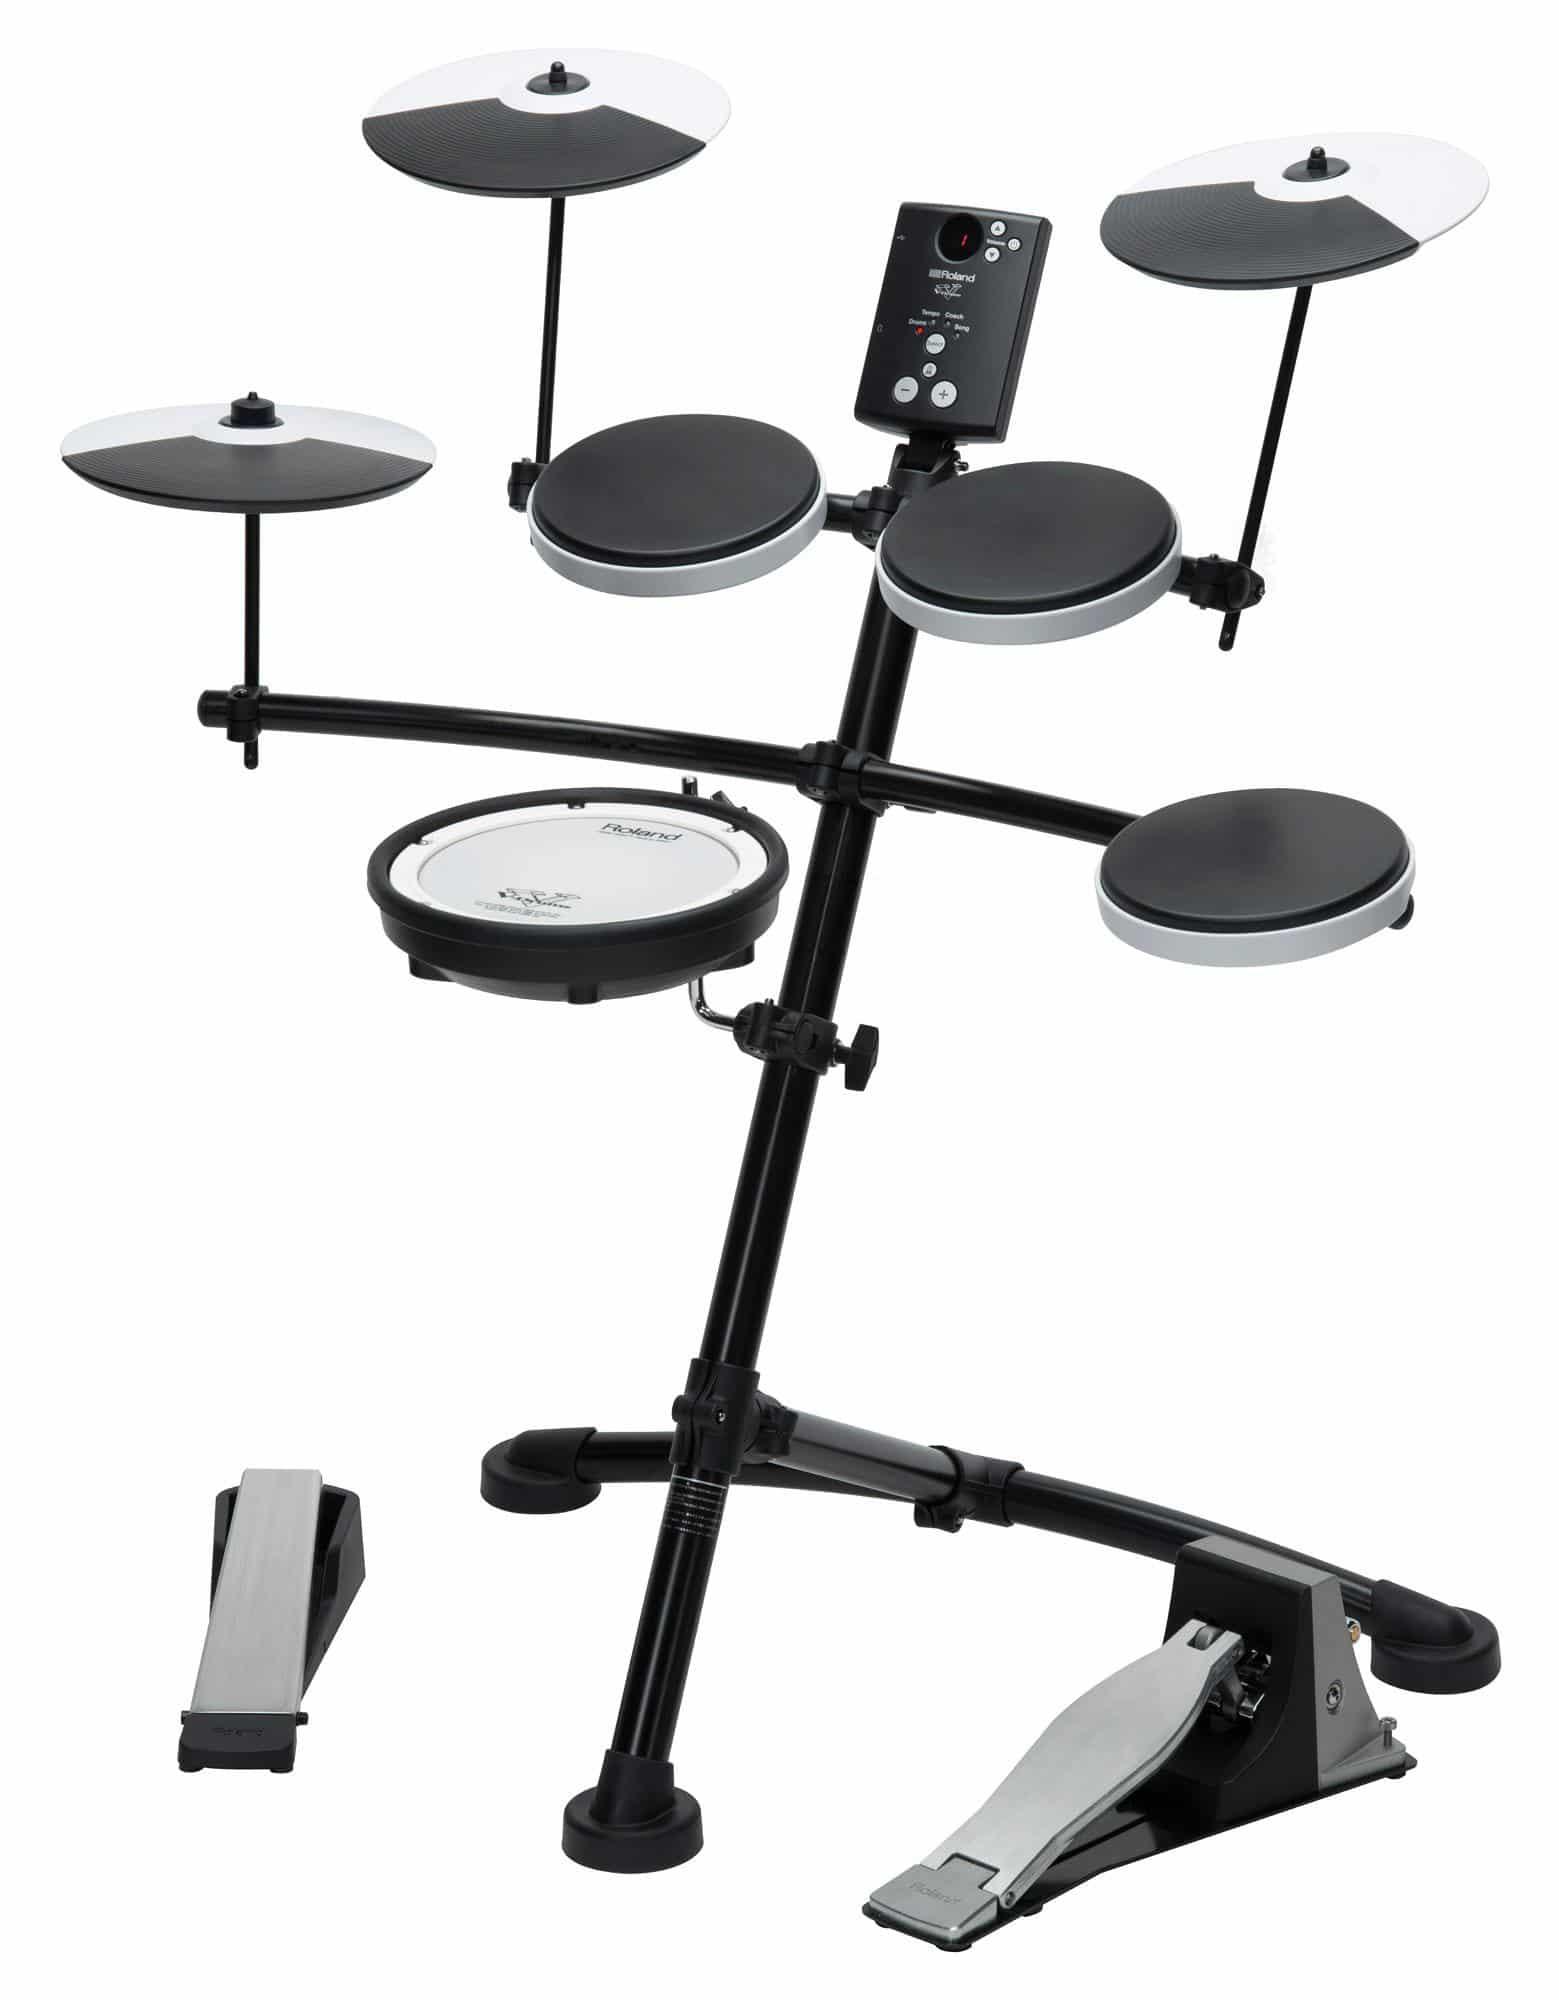 Roland TD 1KV V Drum Set